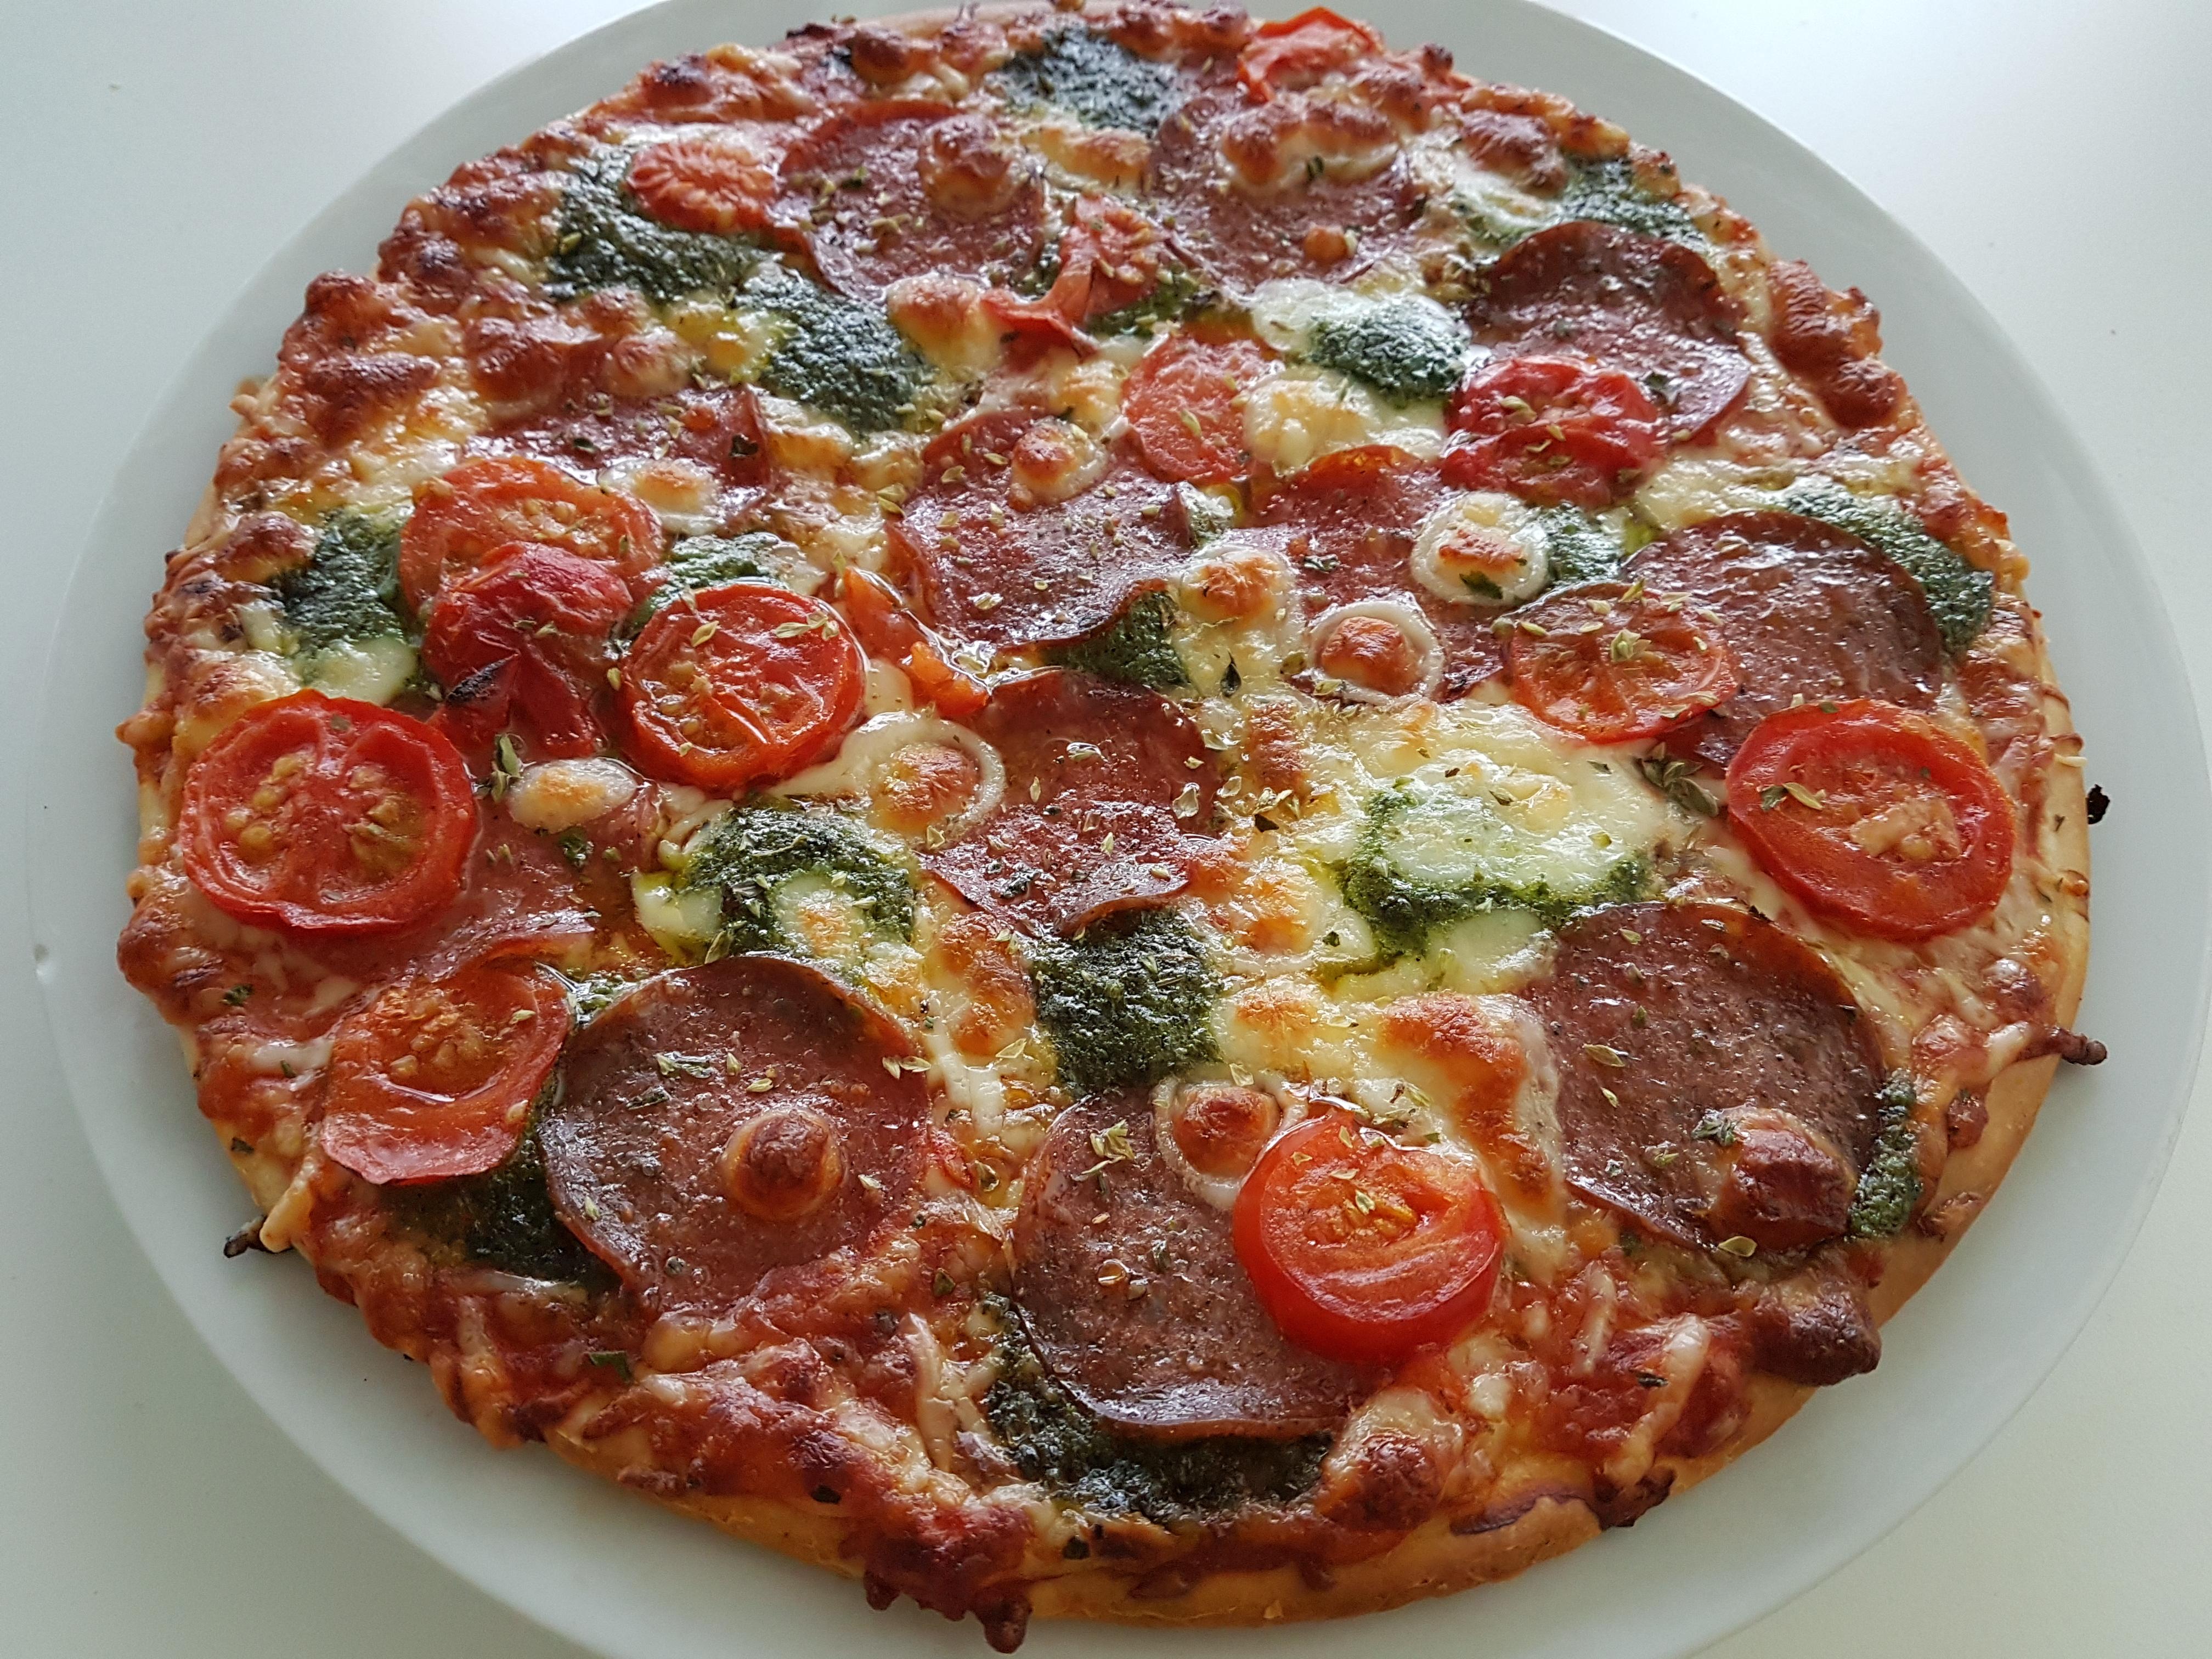 http://foodloader.net/Holz_2017-04-14_Pizza.jpg